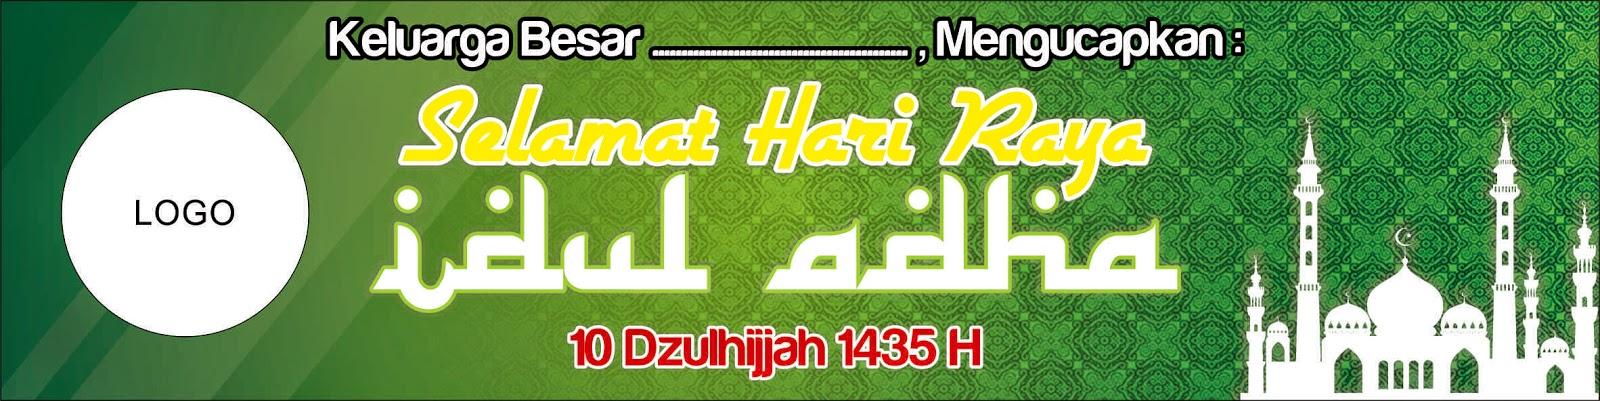 3 Template Spanduk Hari Raya Idul Adha | Design Corel